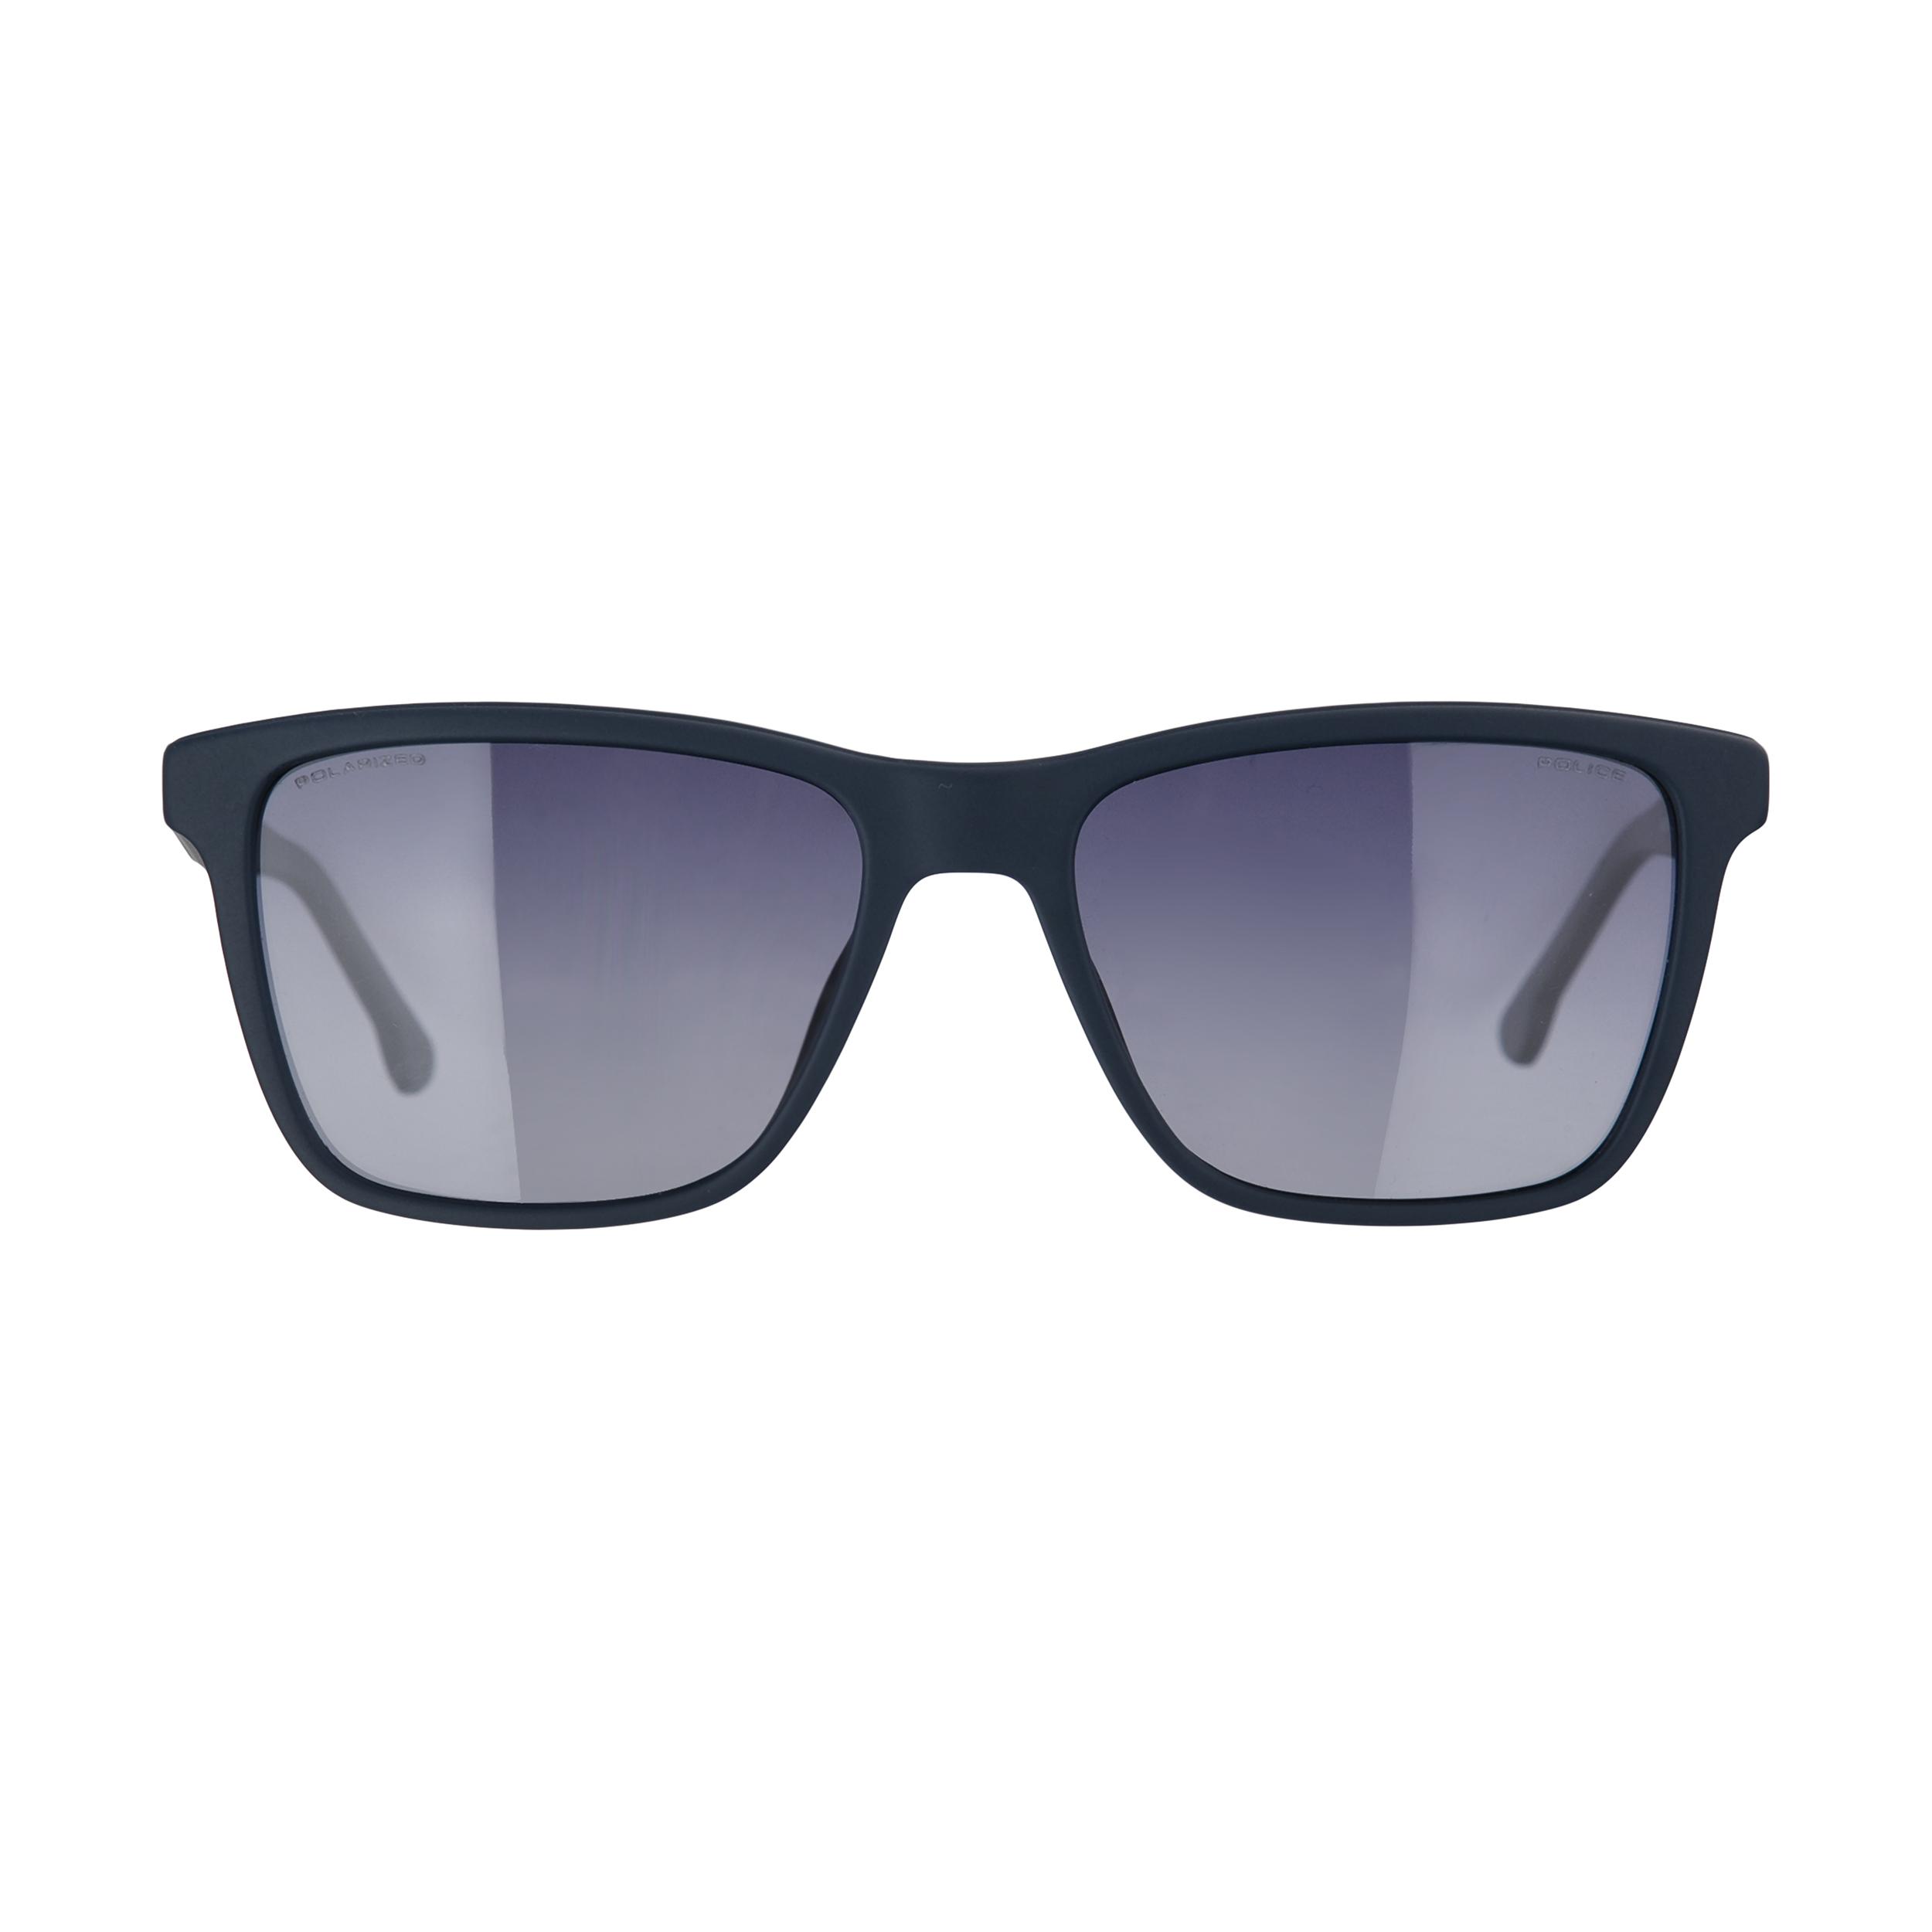 عینک آفتابی پلیس مدل SPL868M 477P -  - 2